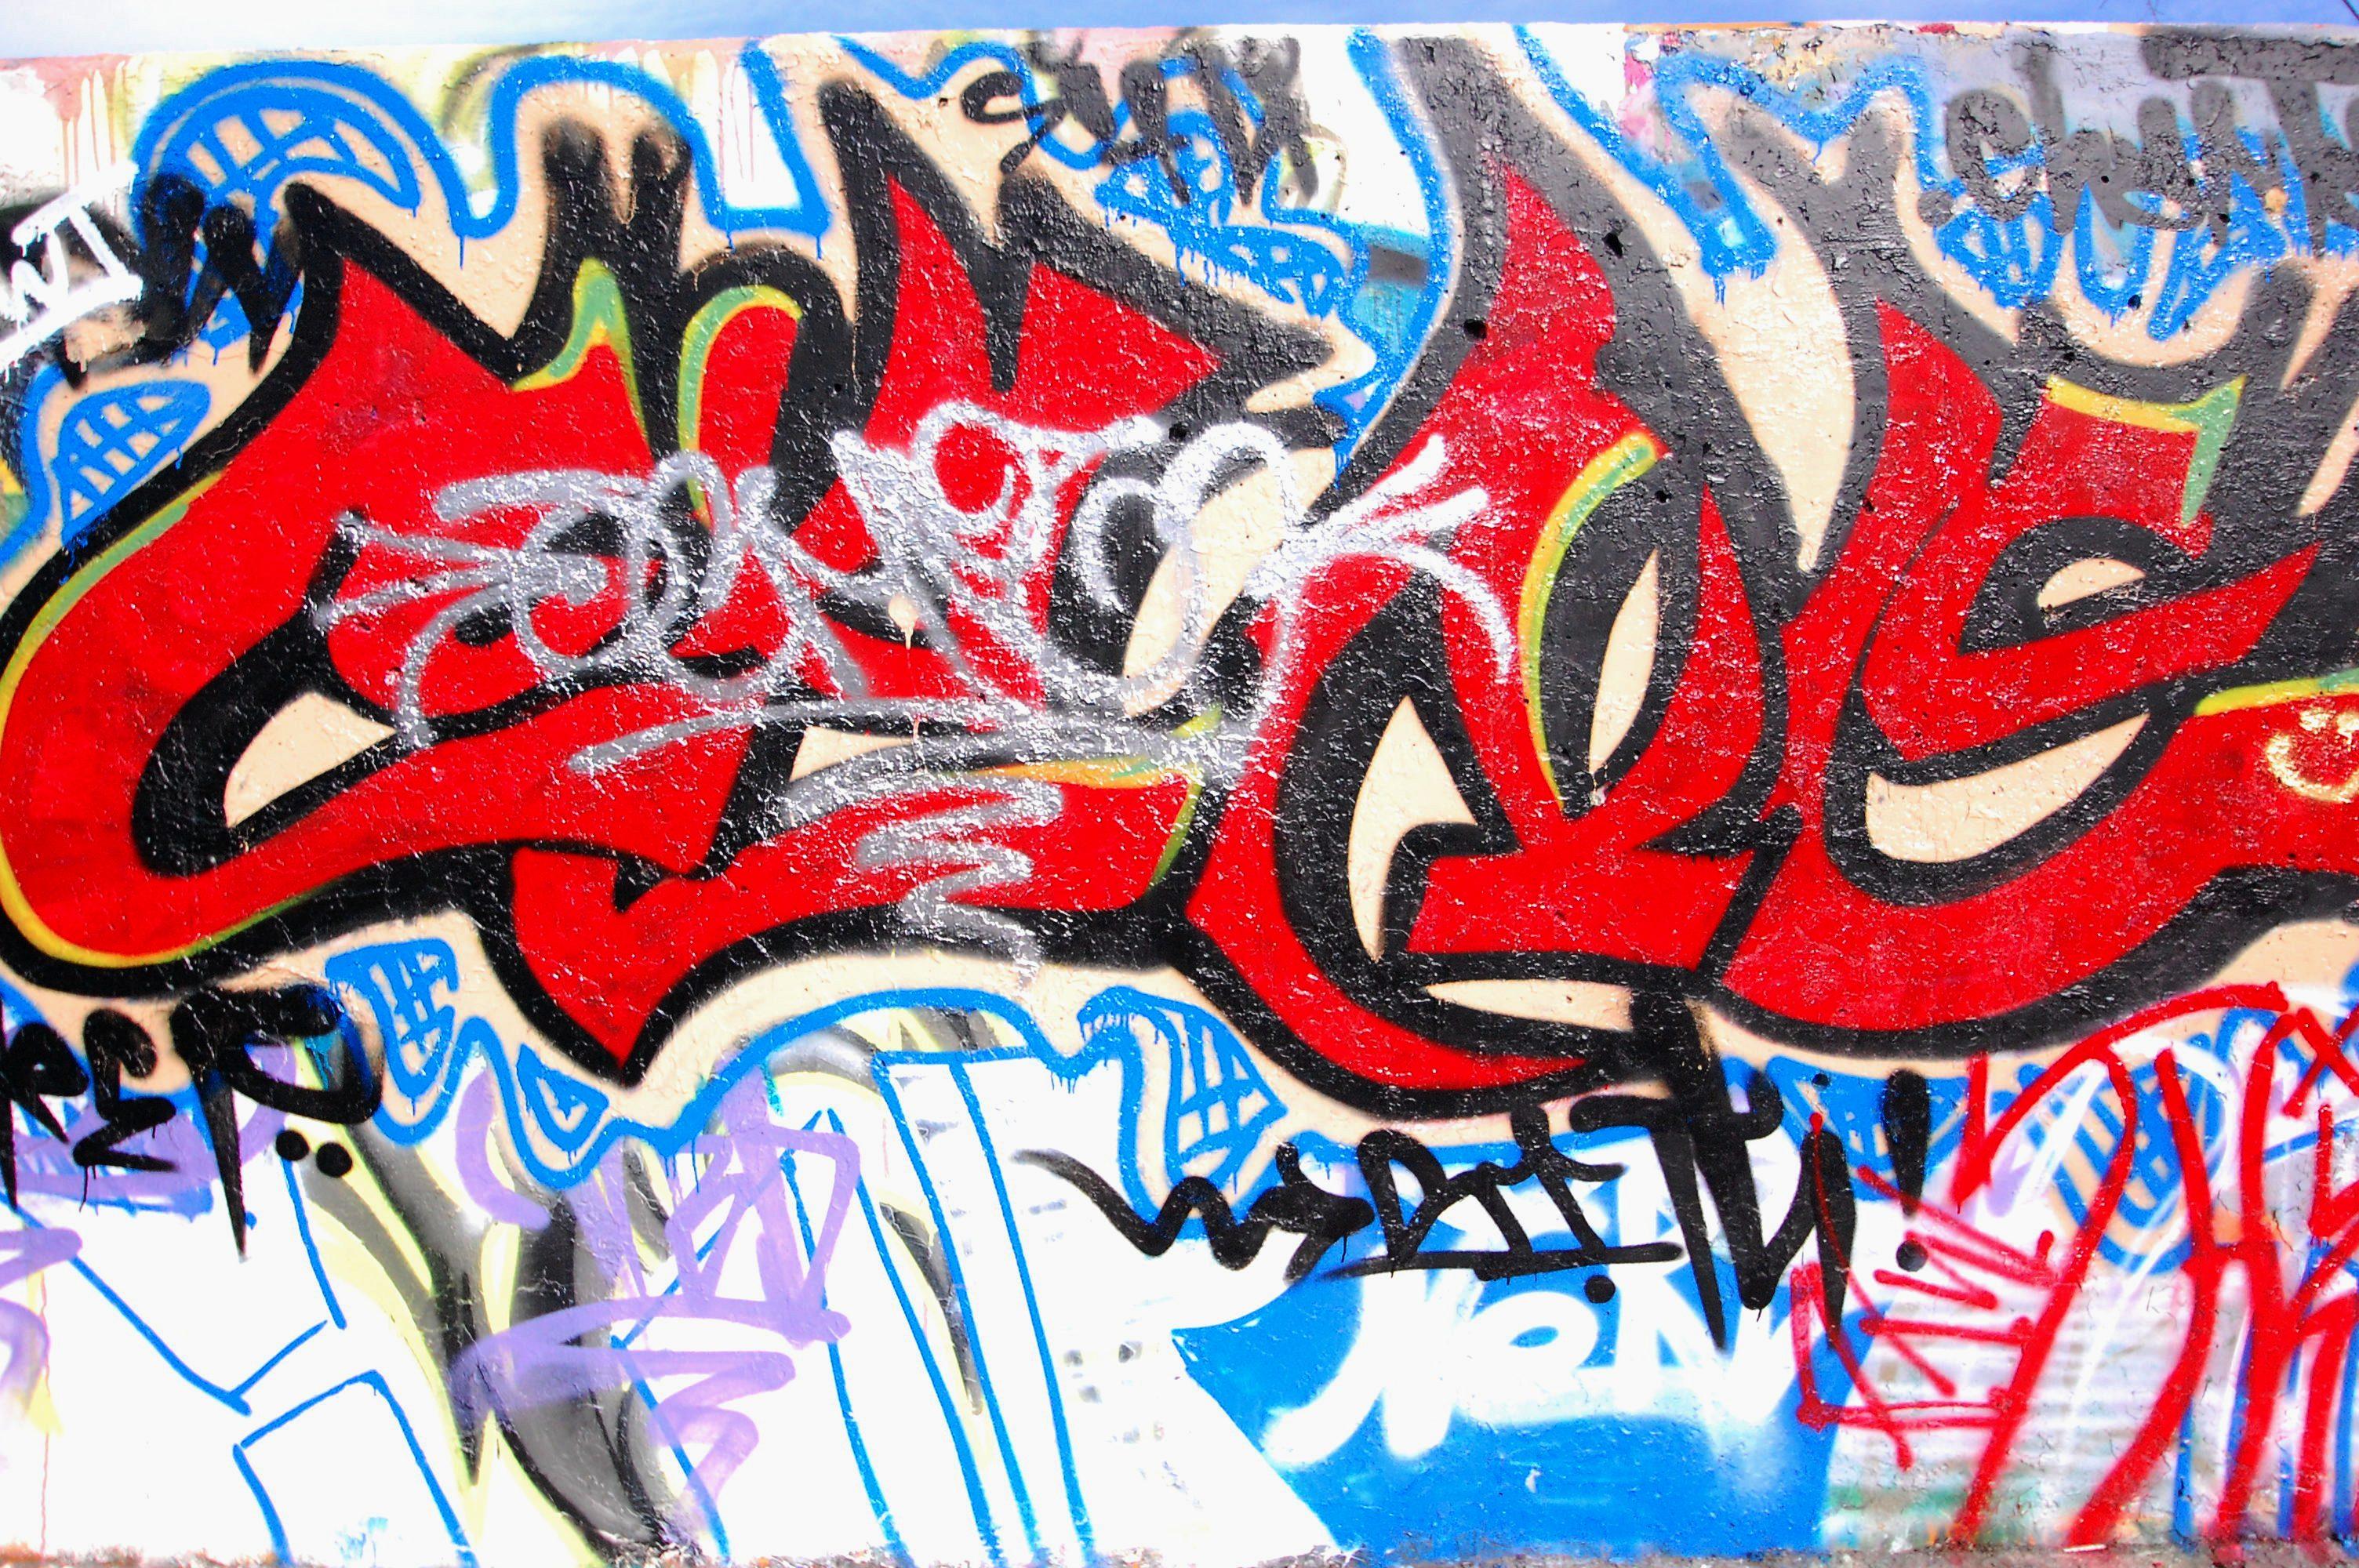 Wp Images Graffiti Post 2